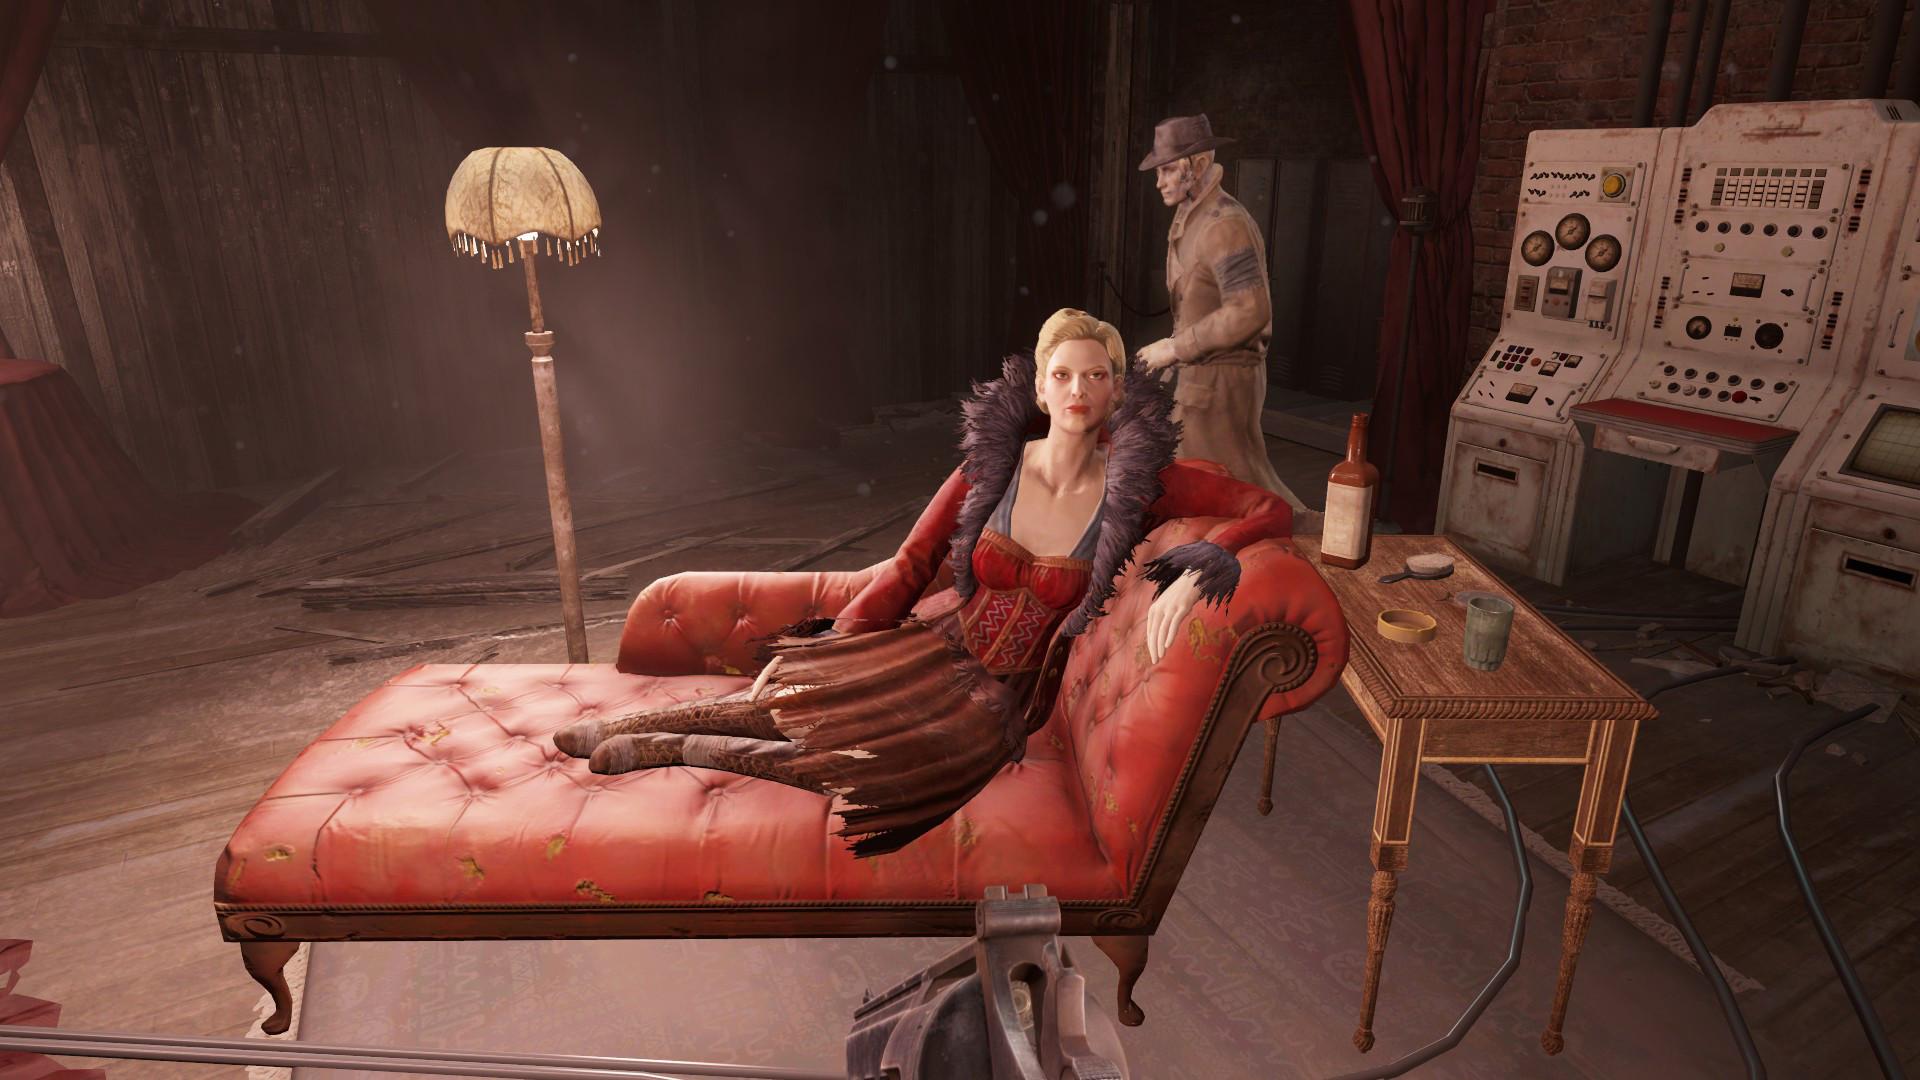 Fallout 4 HD Wallpaper Sexy Woman Creepy Dude